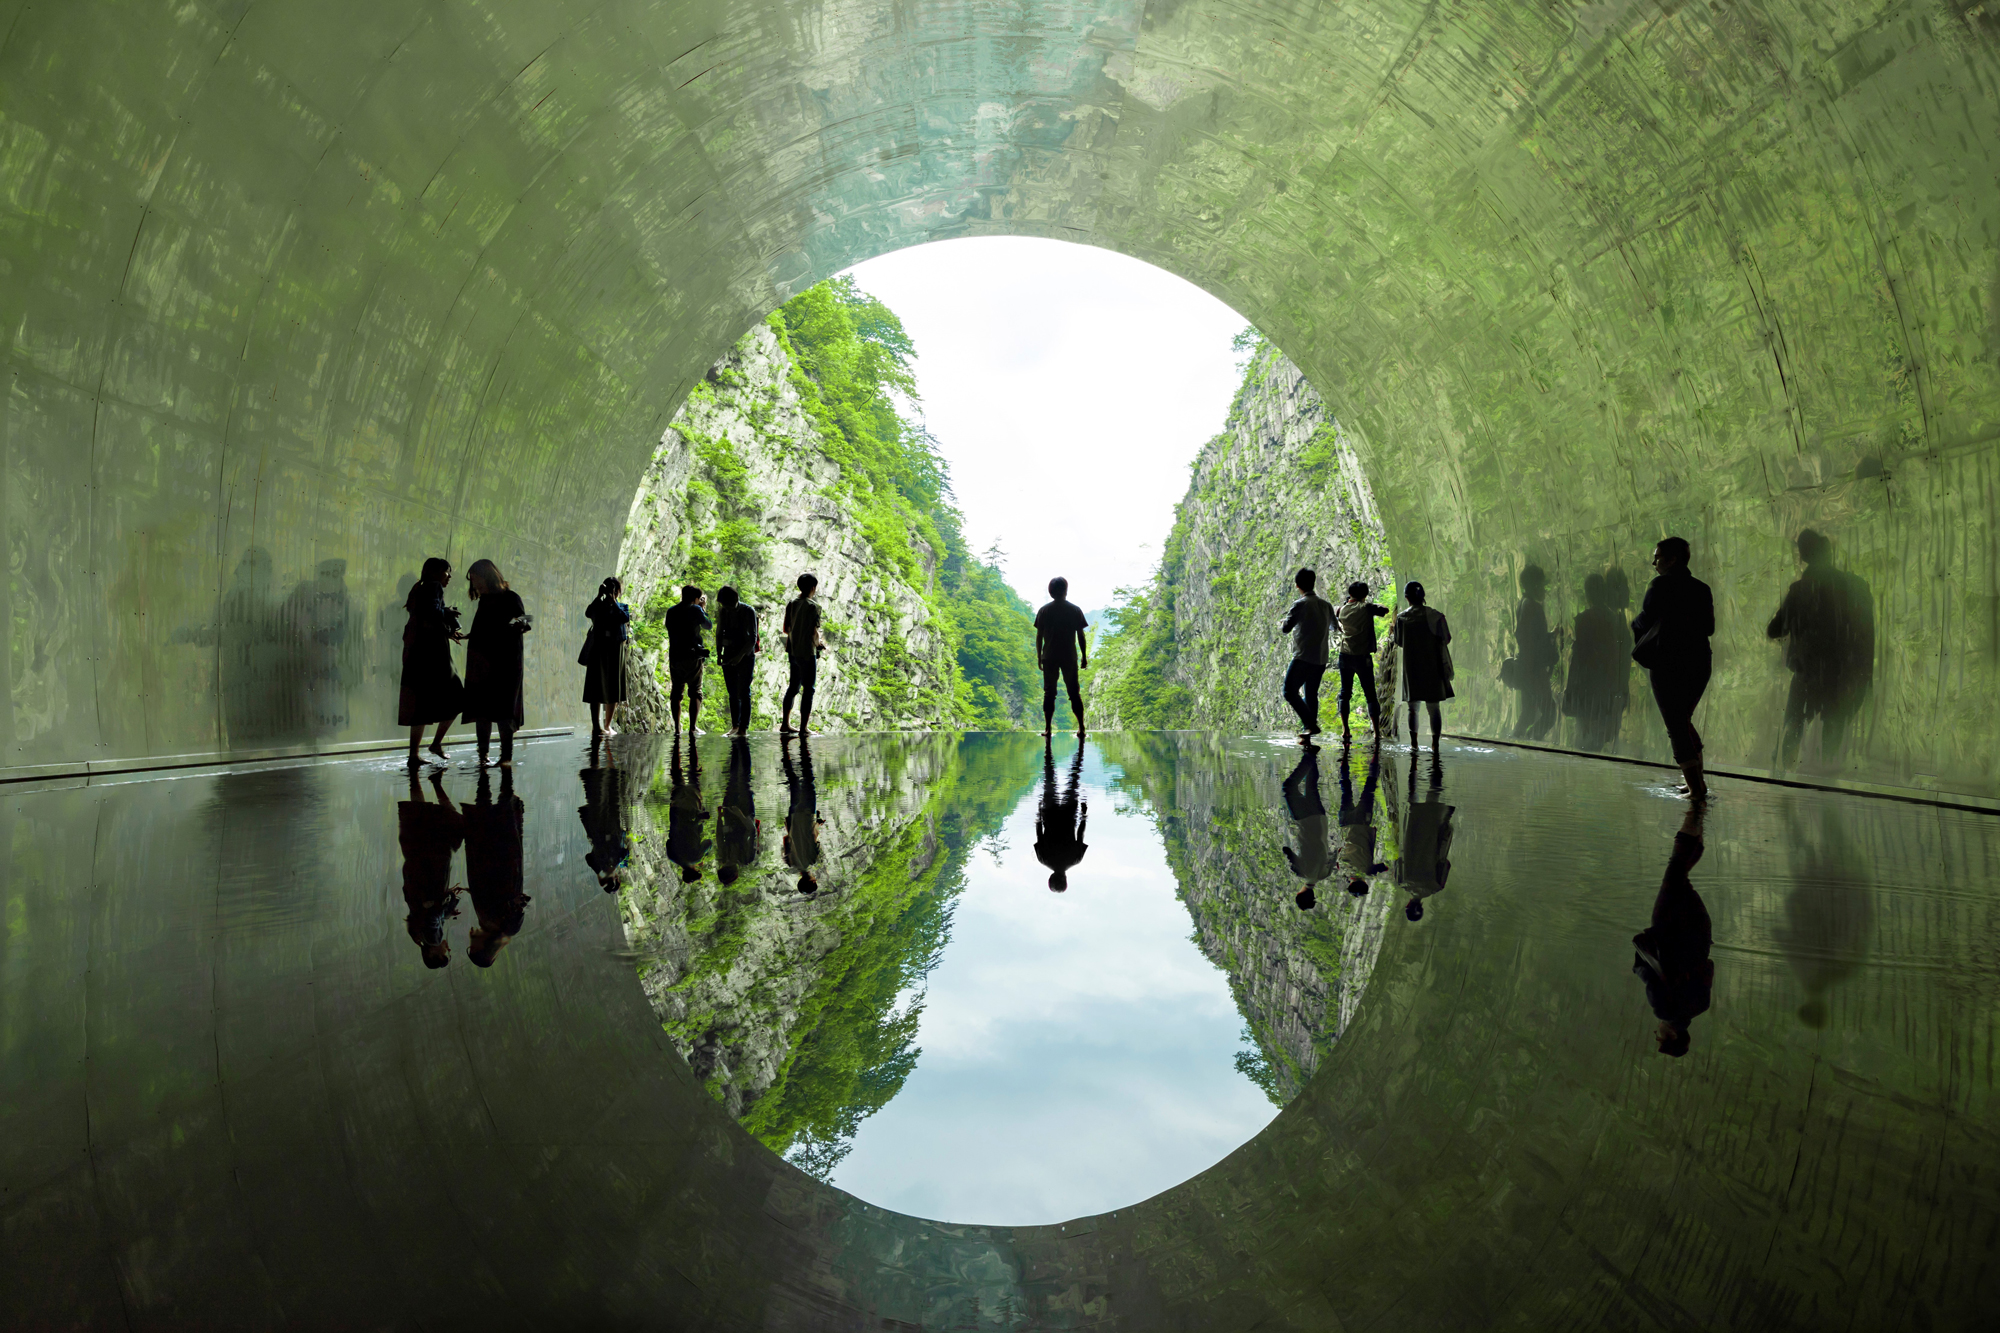 17_MAD_Echigo Tsumari_Tunnel of Light_Light Cave_by Osamu Nakamura